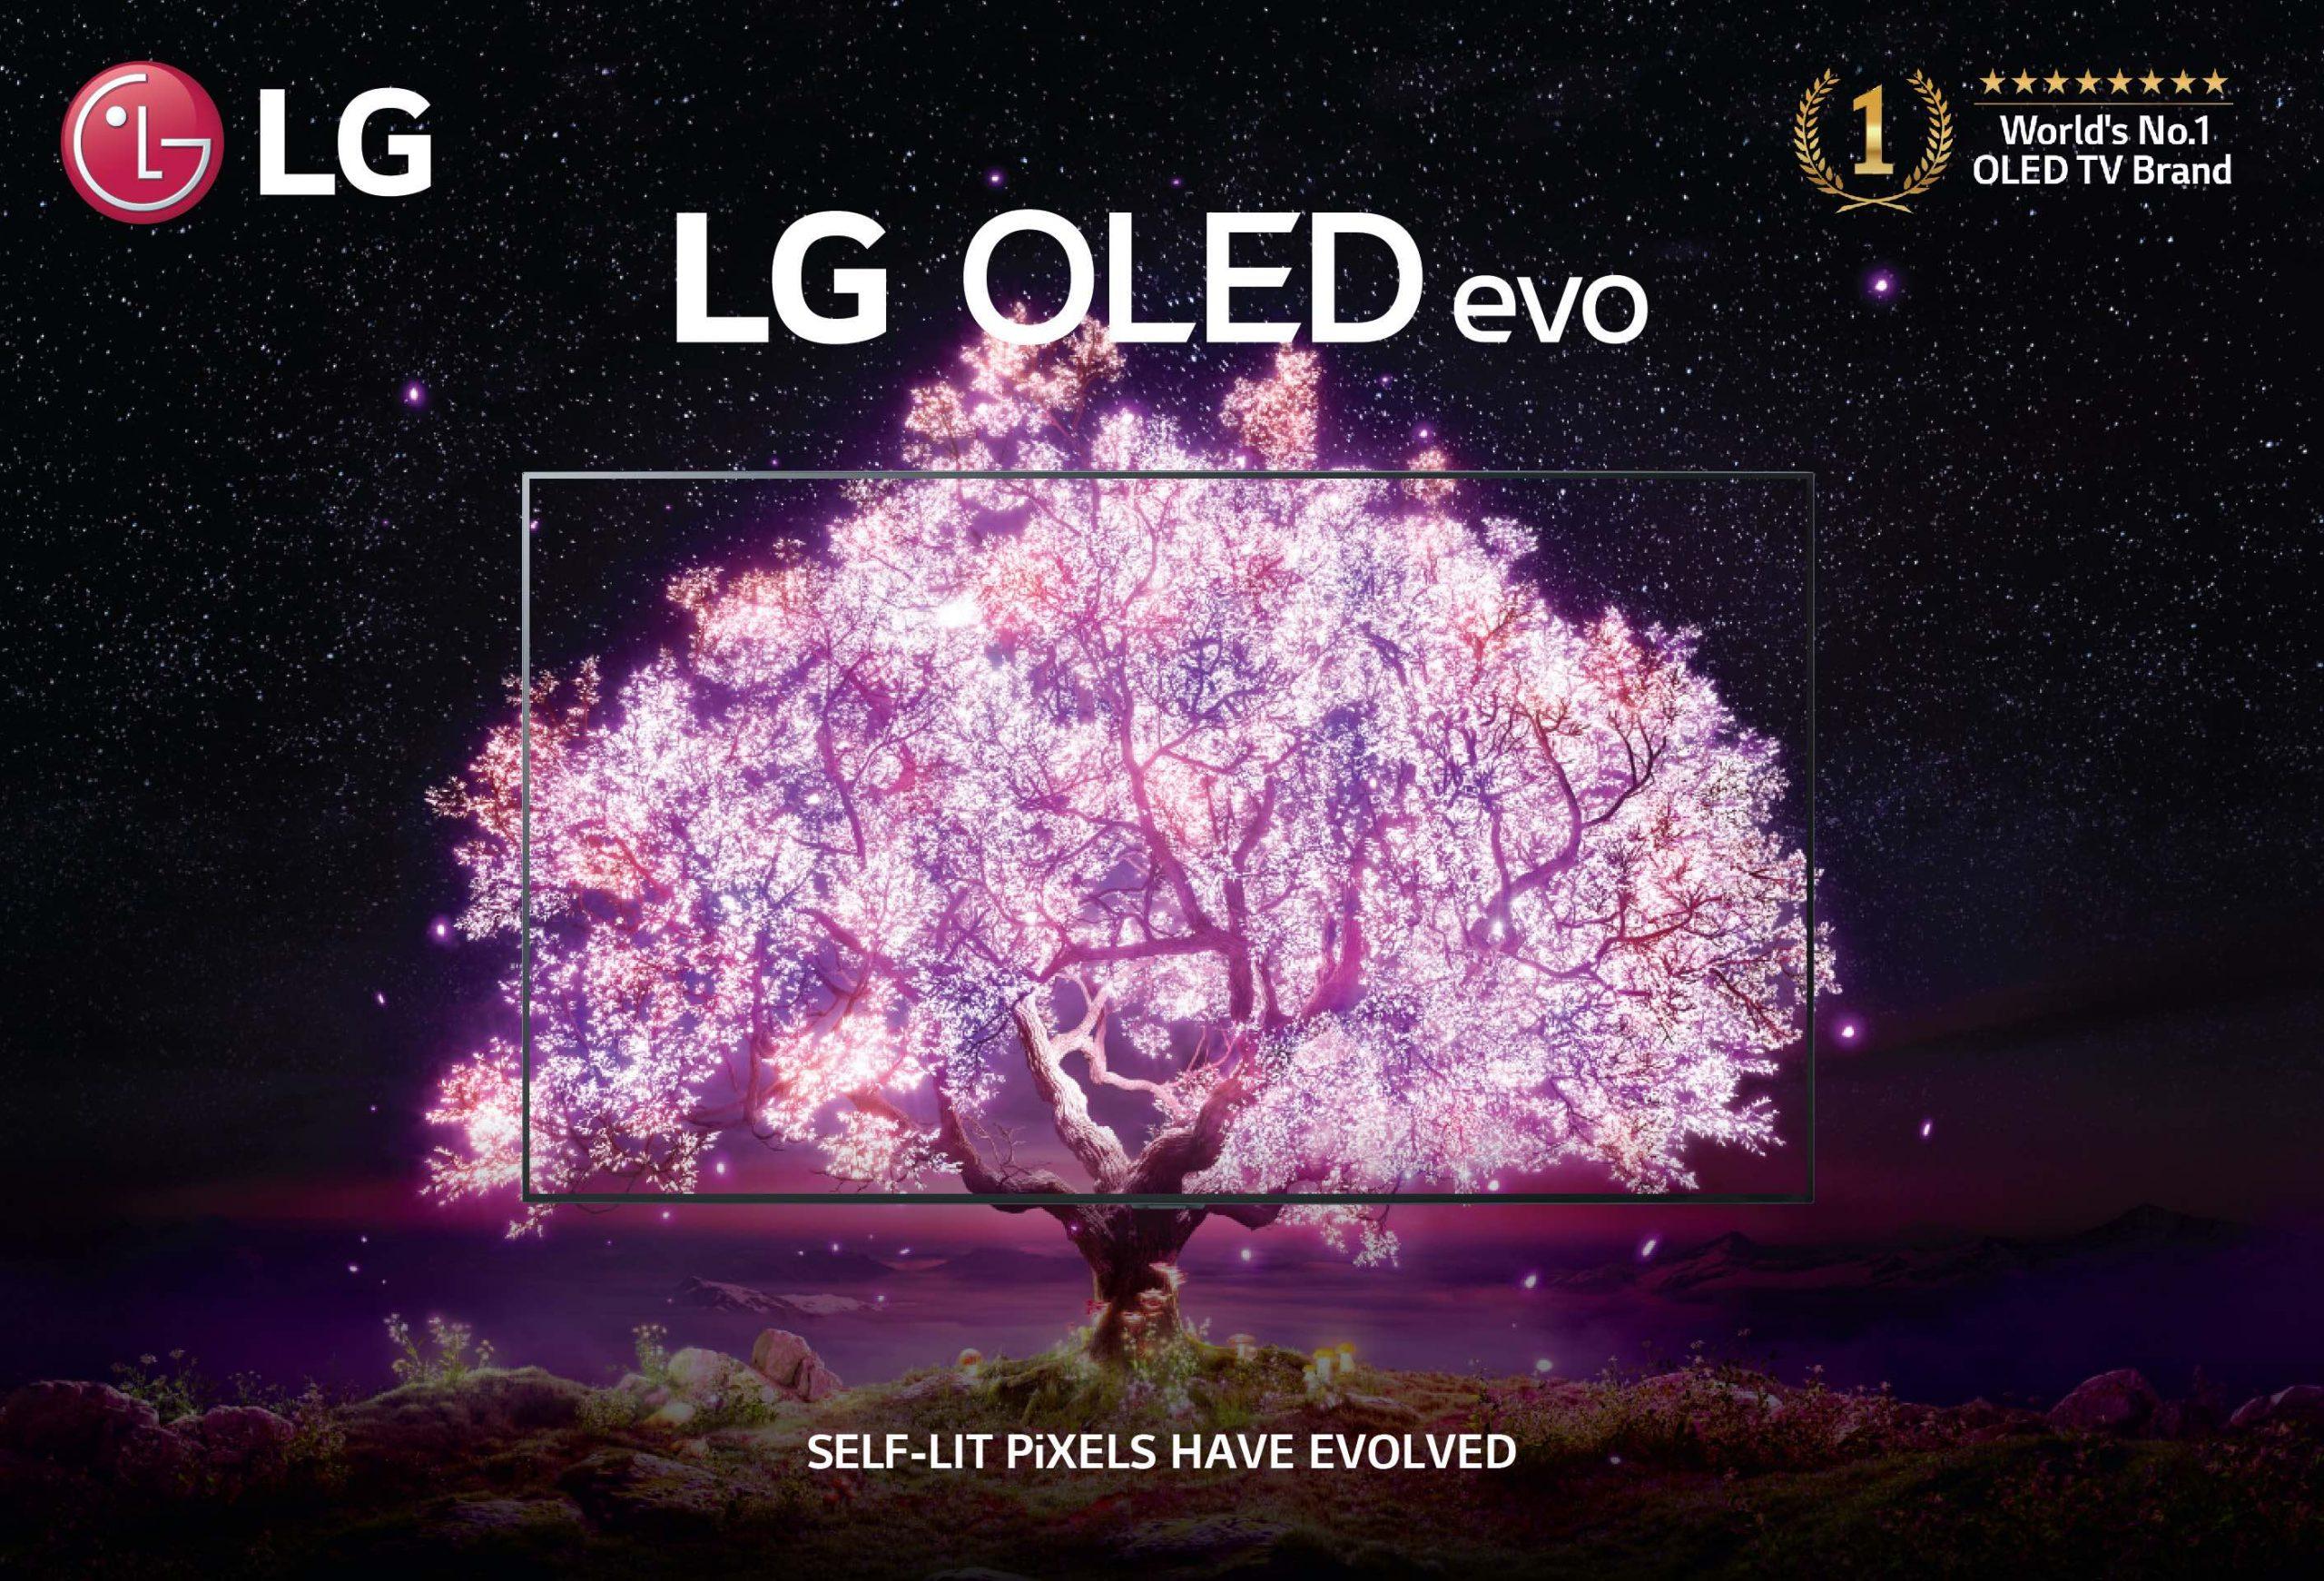 Let LG Light Up Your World